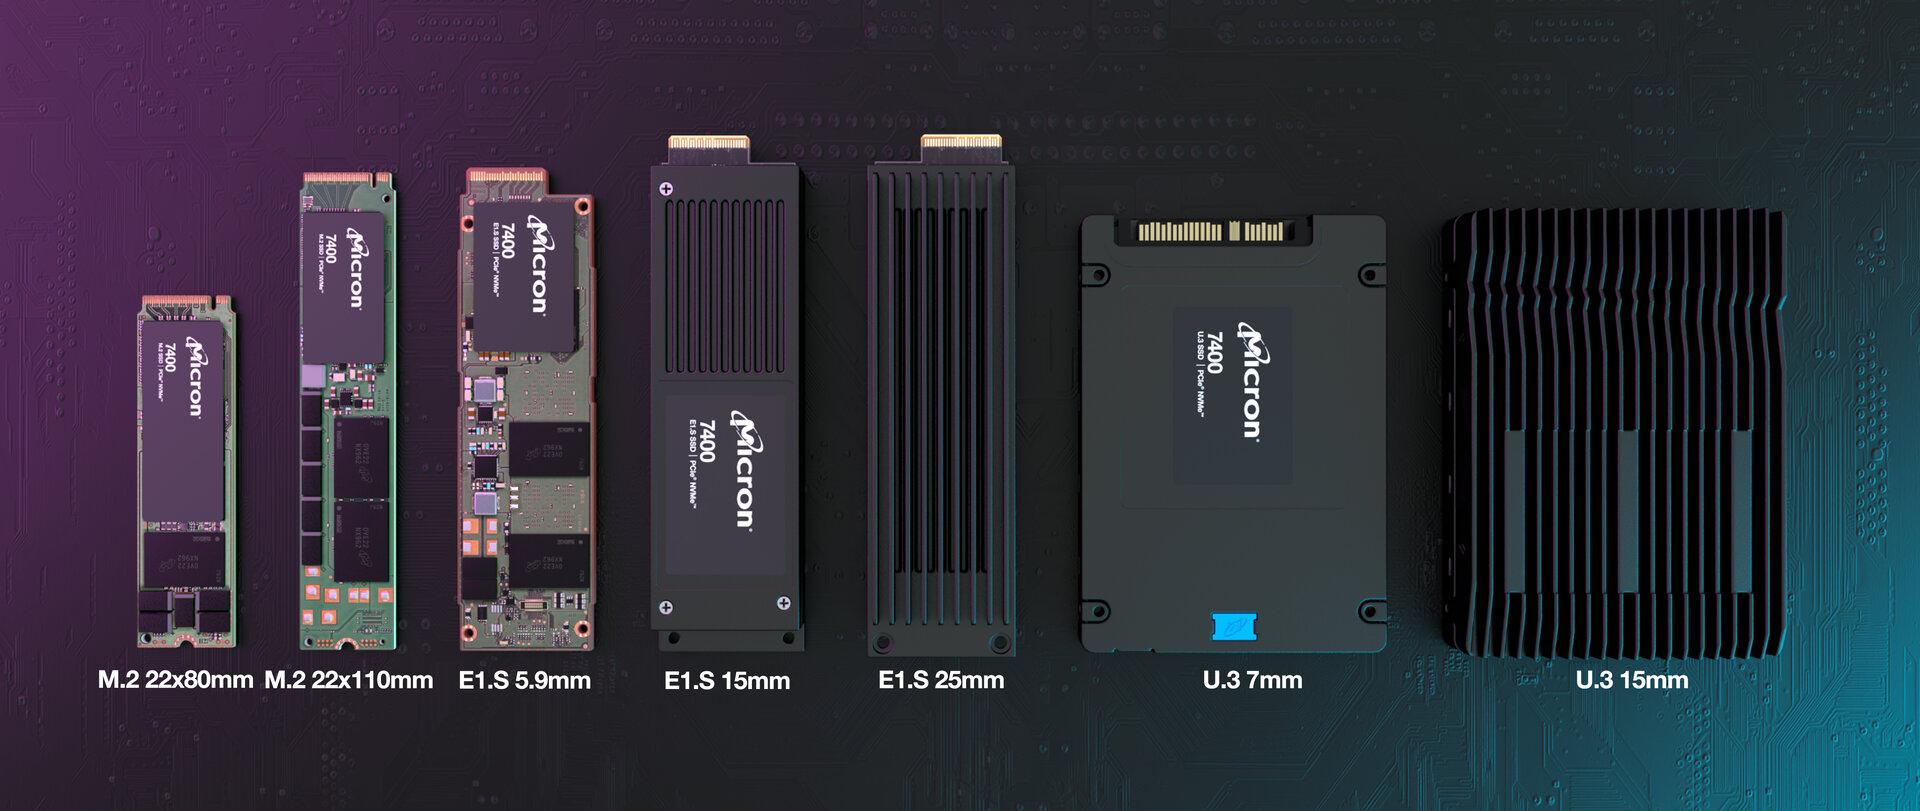 SSD-Family Micron 7400